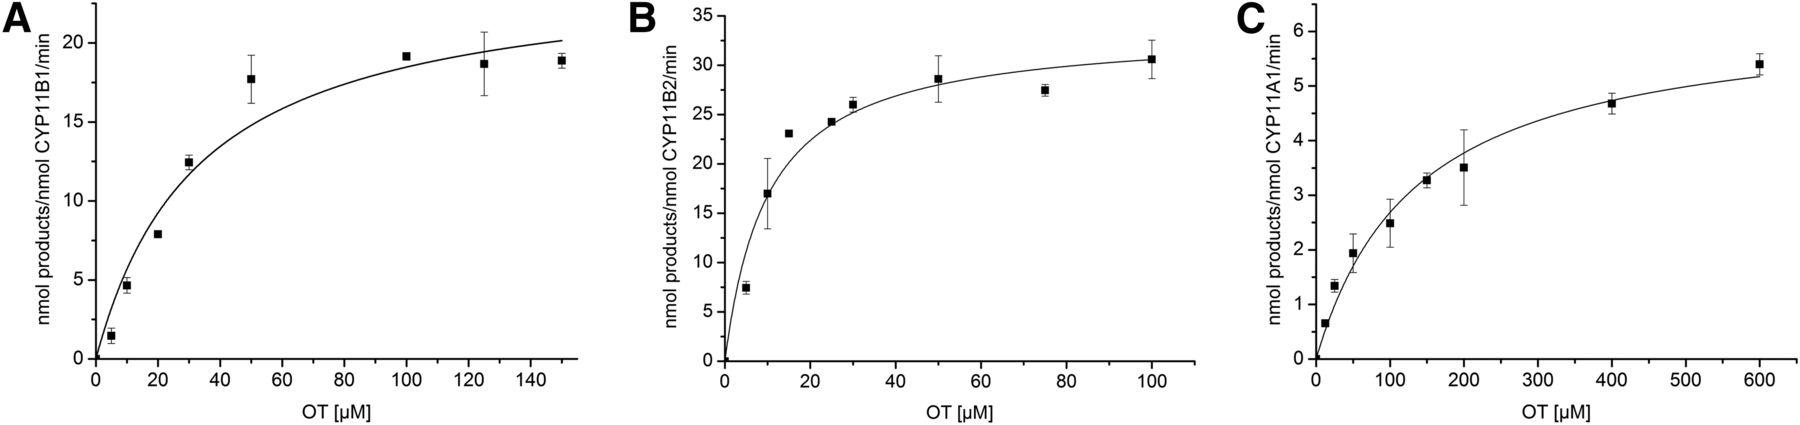 steroid conversion ratio